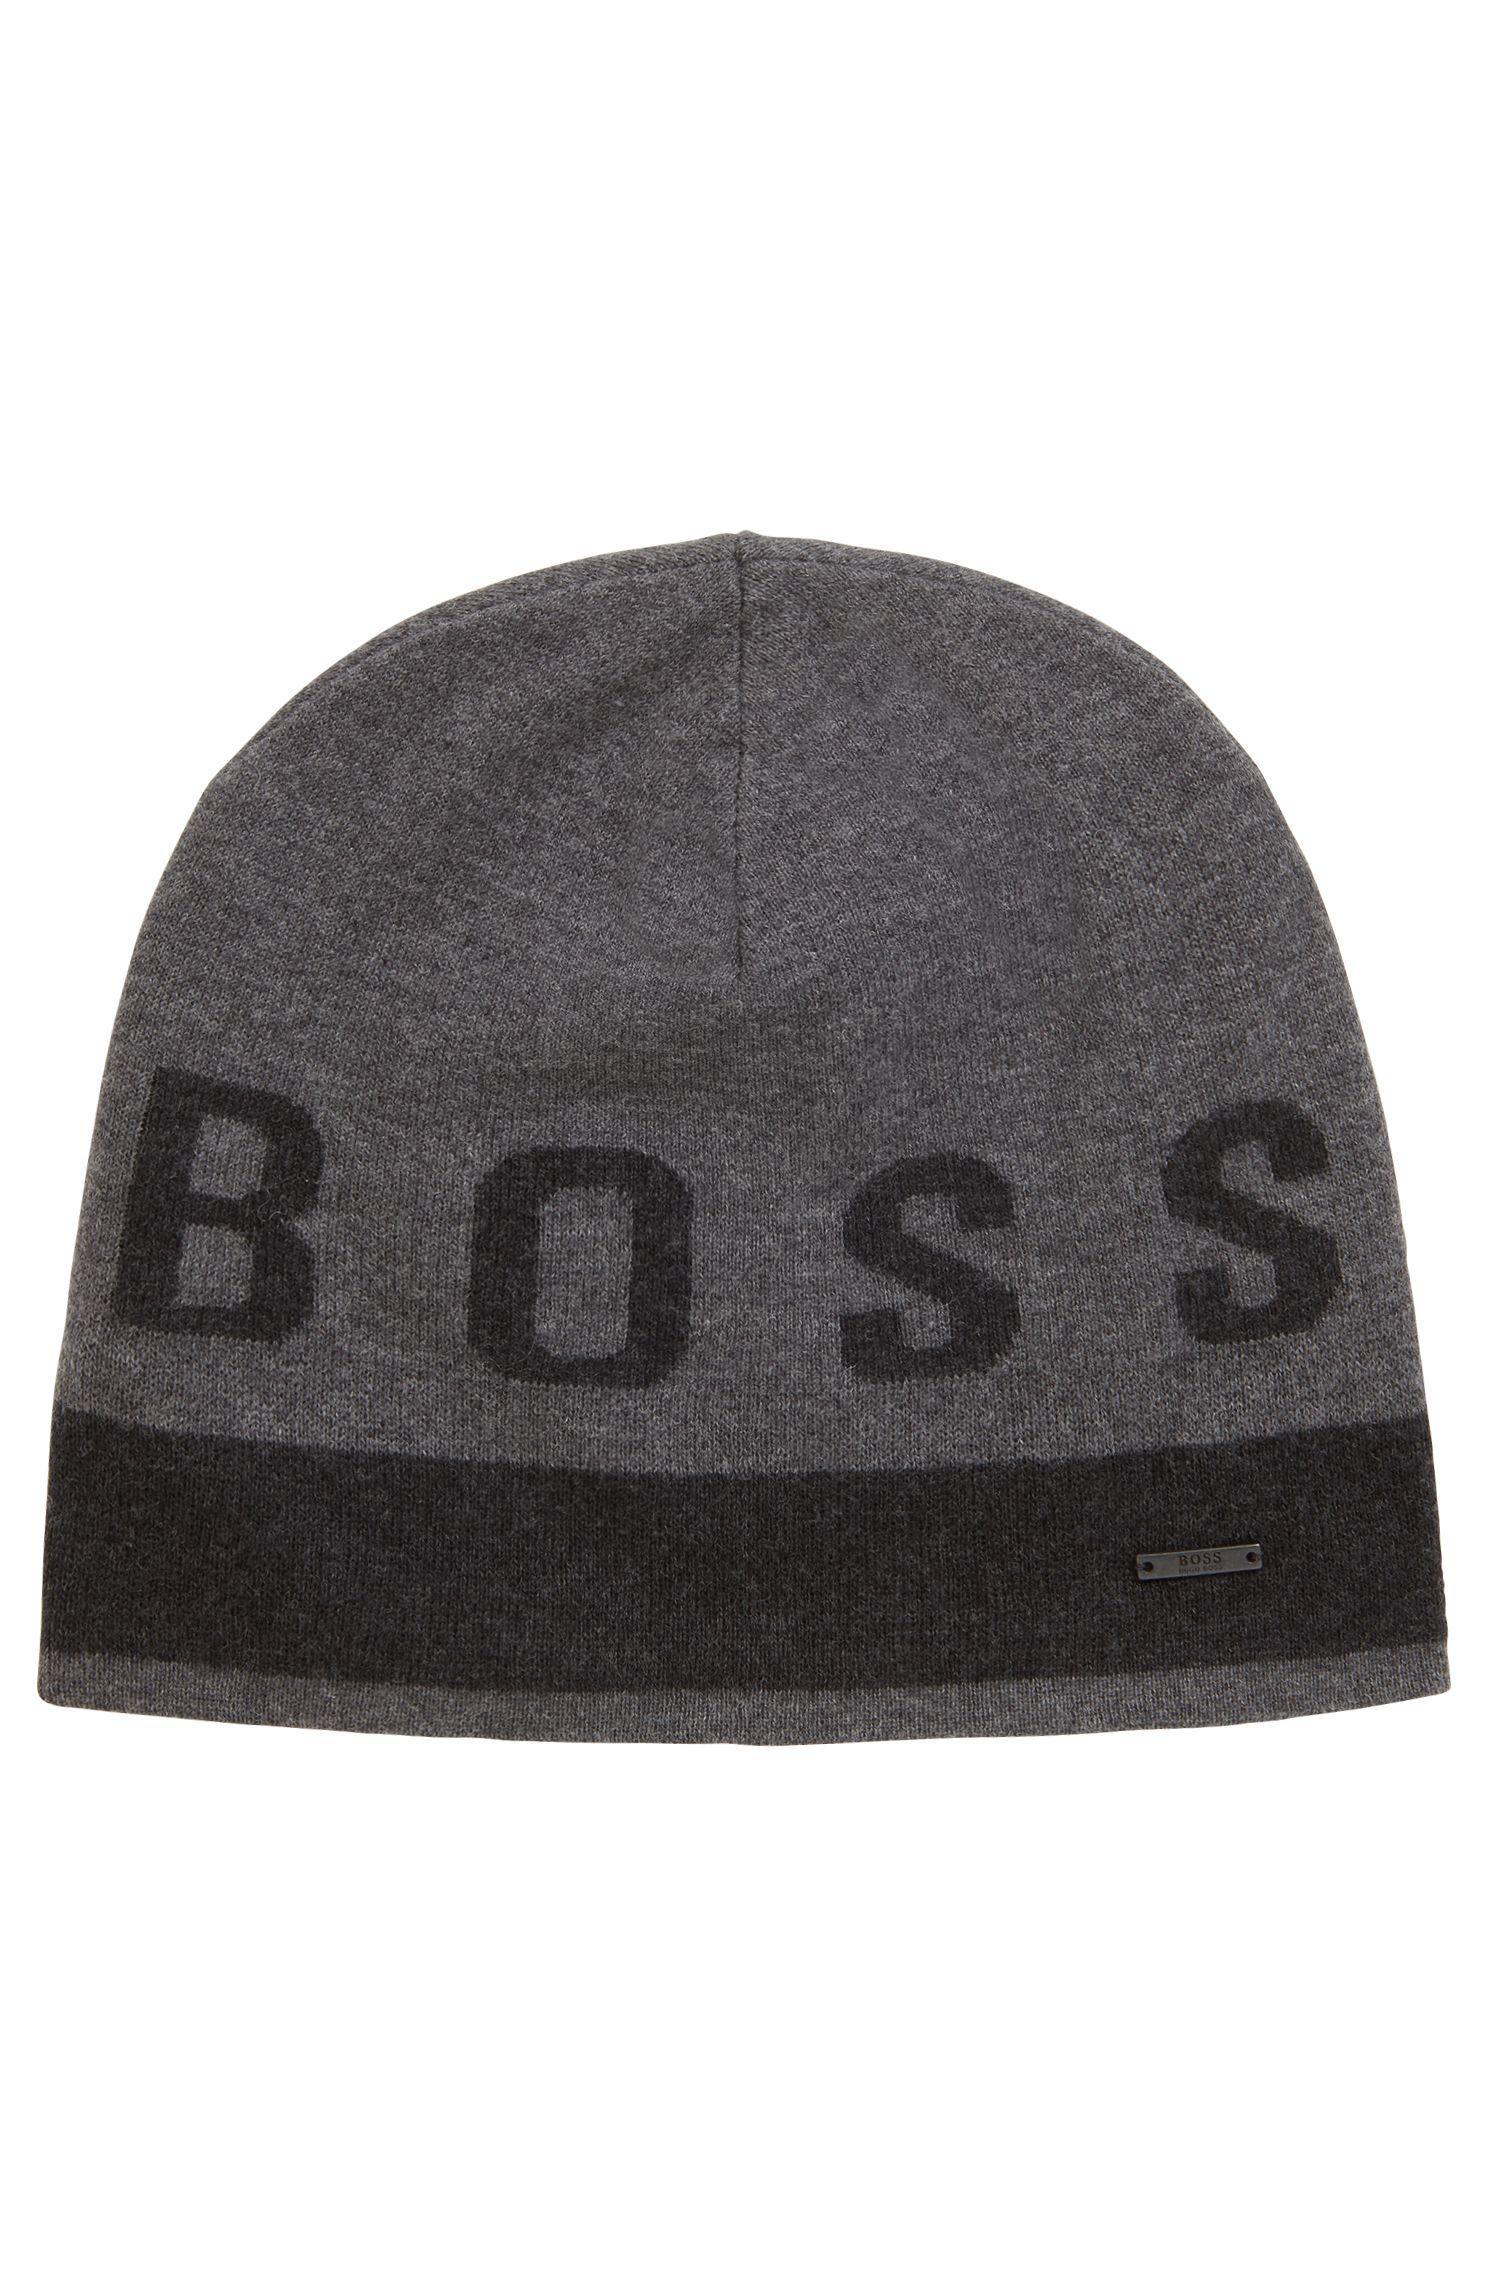 Mütze aus Baumwoll-Mix mit Kontrast-Logo, Grau